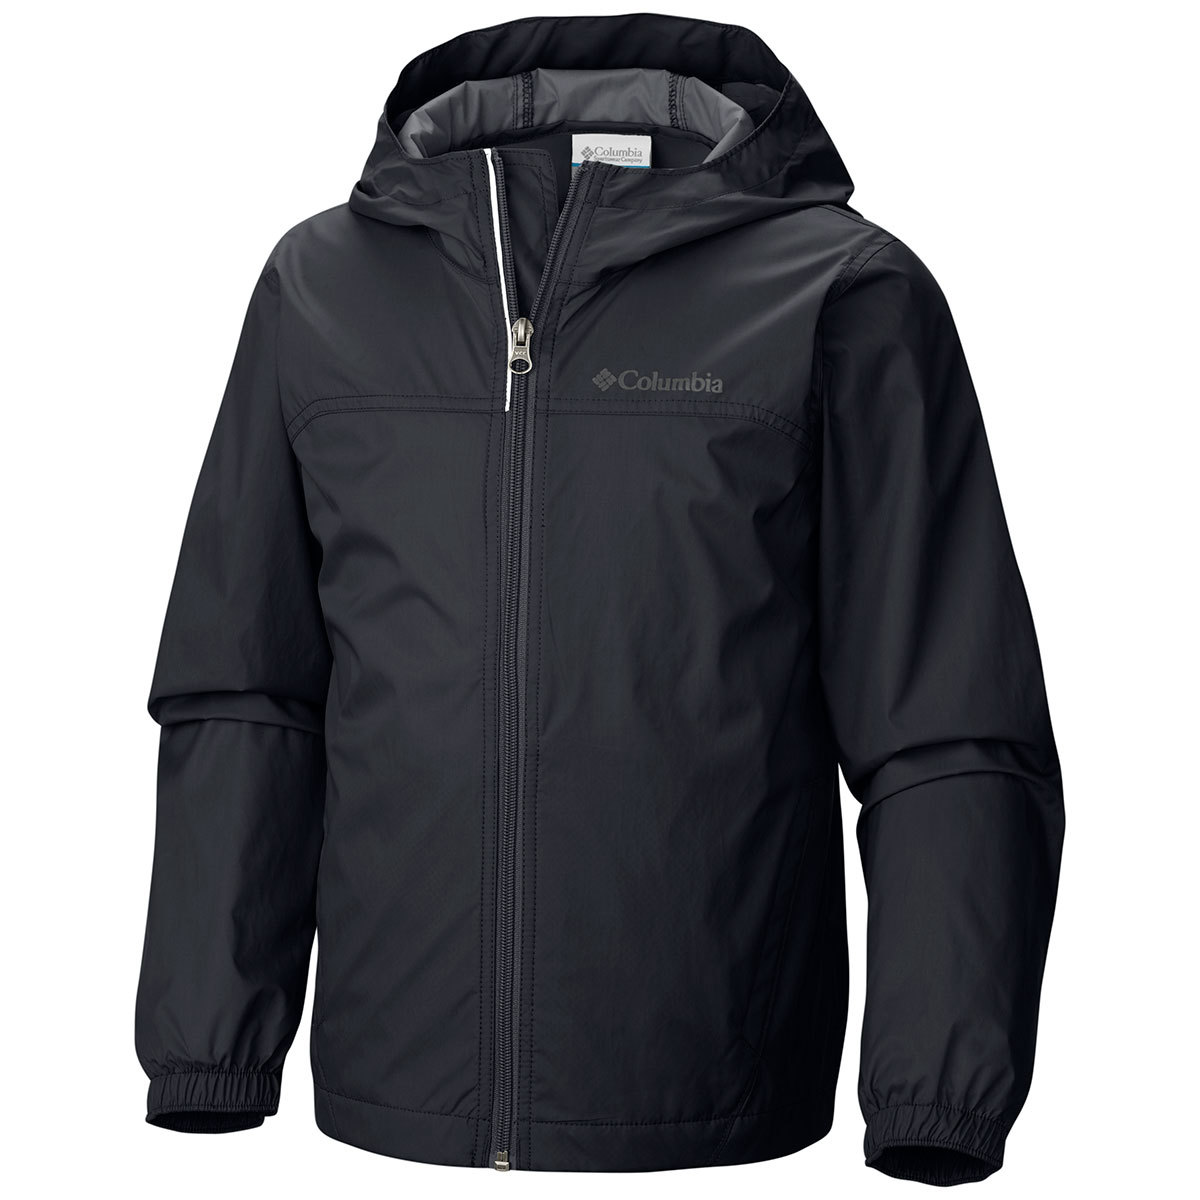 Columbia Boys Glennaker Waterproof Jacket - Black, L